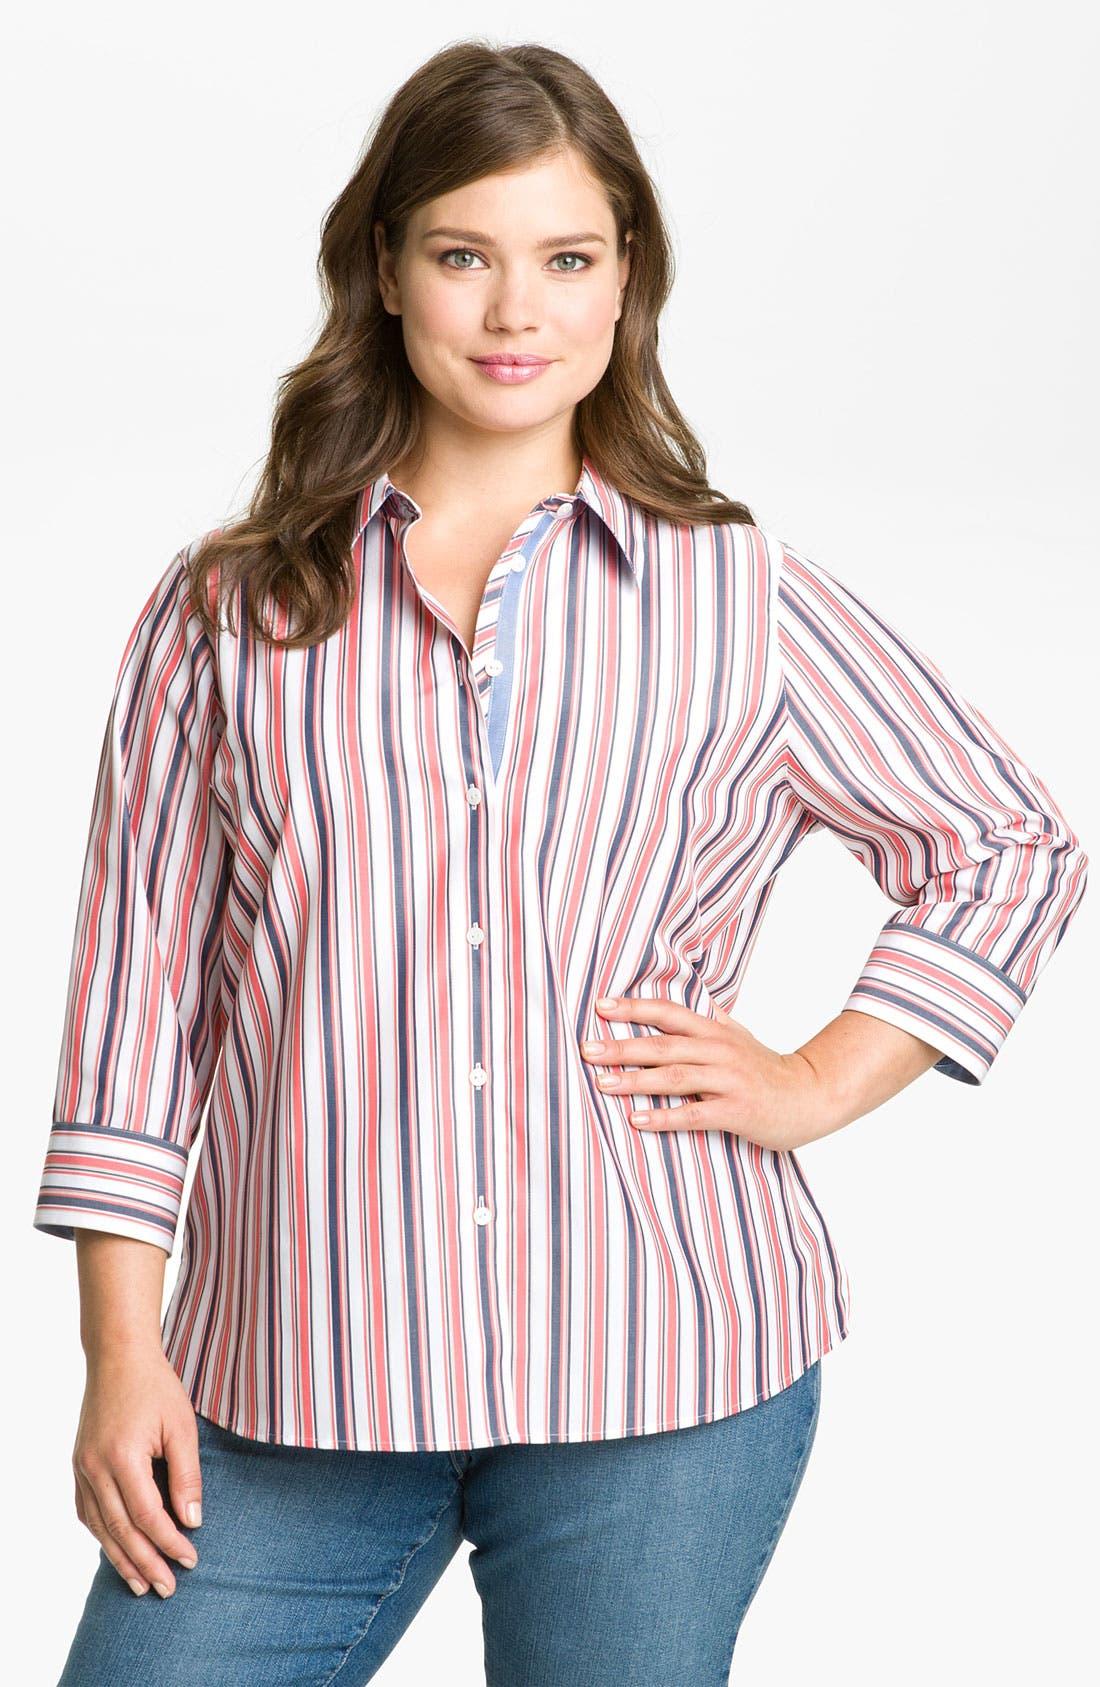 Alternate Image 1 Selected - Foxcroft 'Summer Stripe' Blouse (Plus)